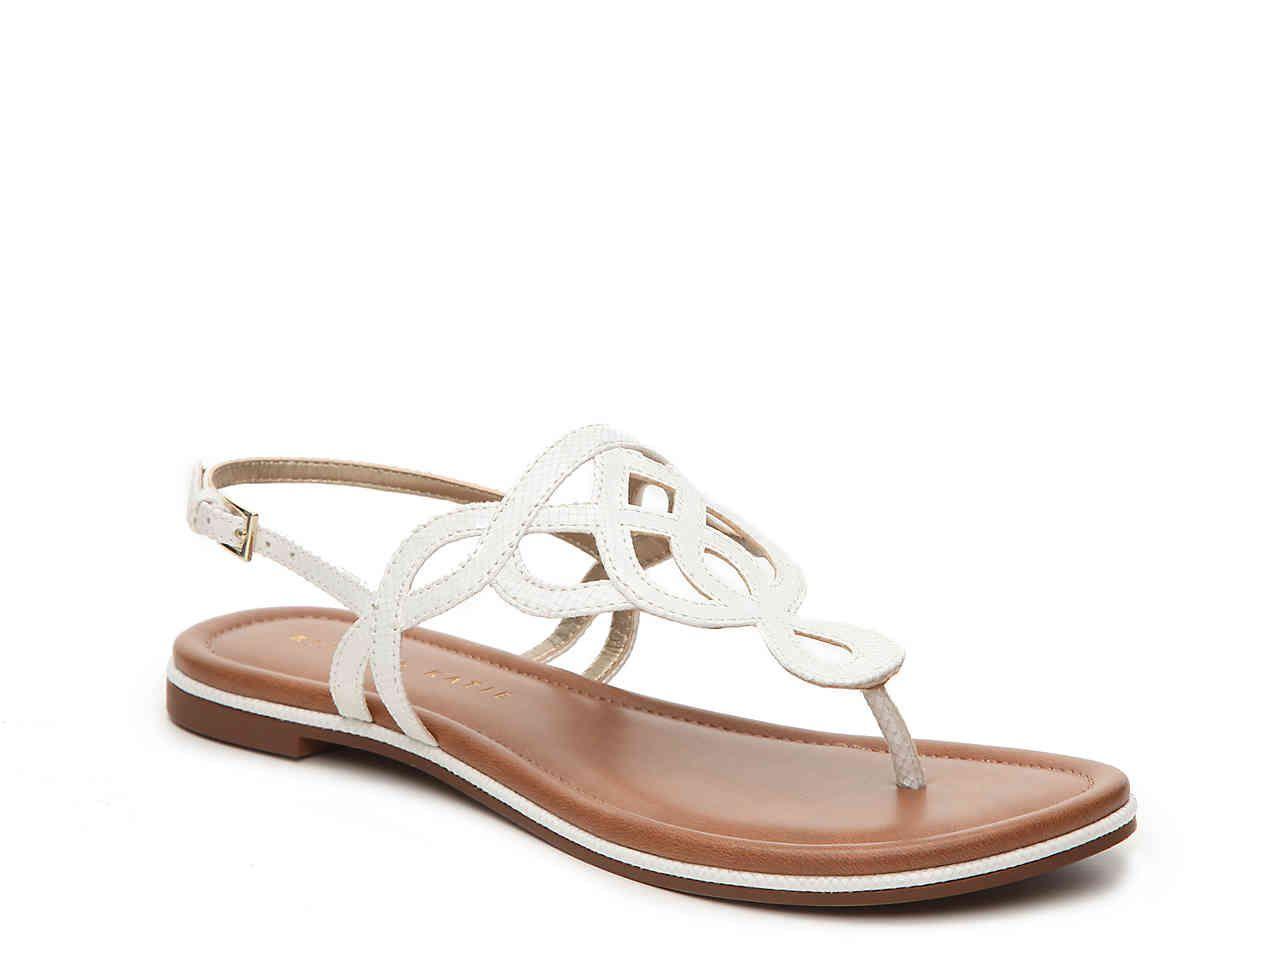 5753640a1b7f DSW - Kelly   Katie Poppie Flat Sandal Size 7.5 Preferably White   Black